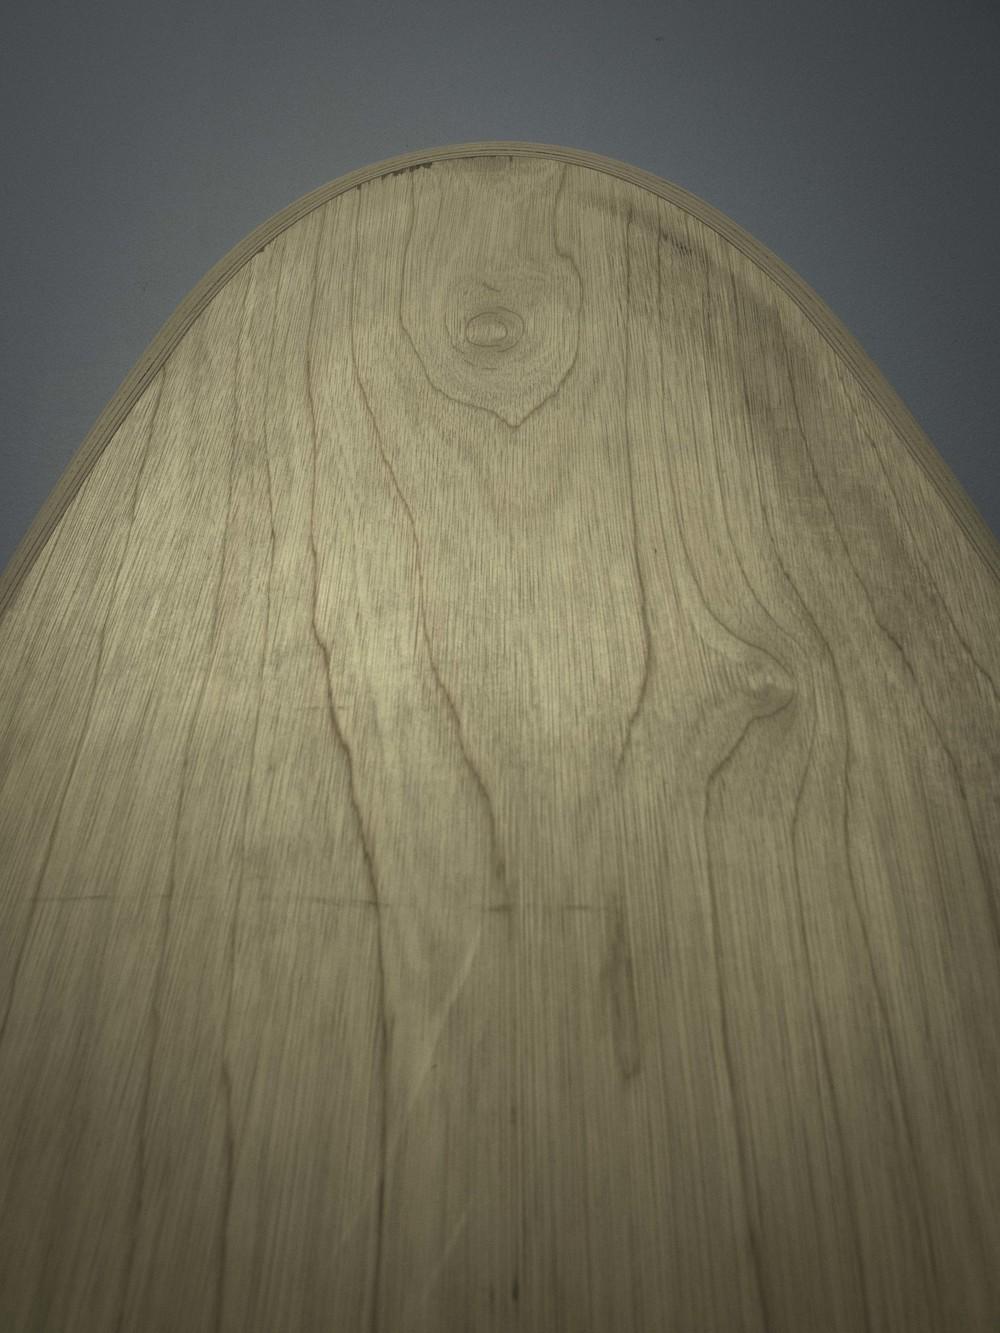 Bodhi Tree Surfboards-7.jpg